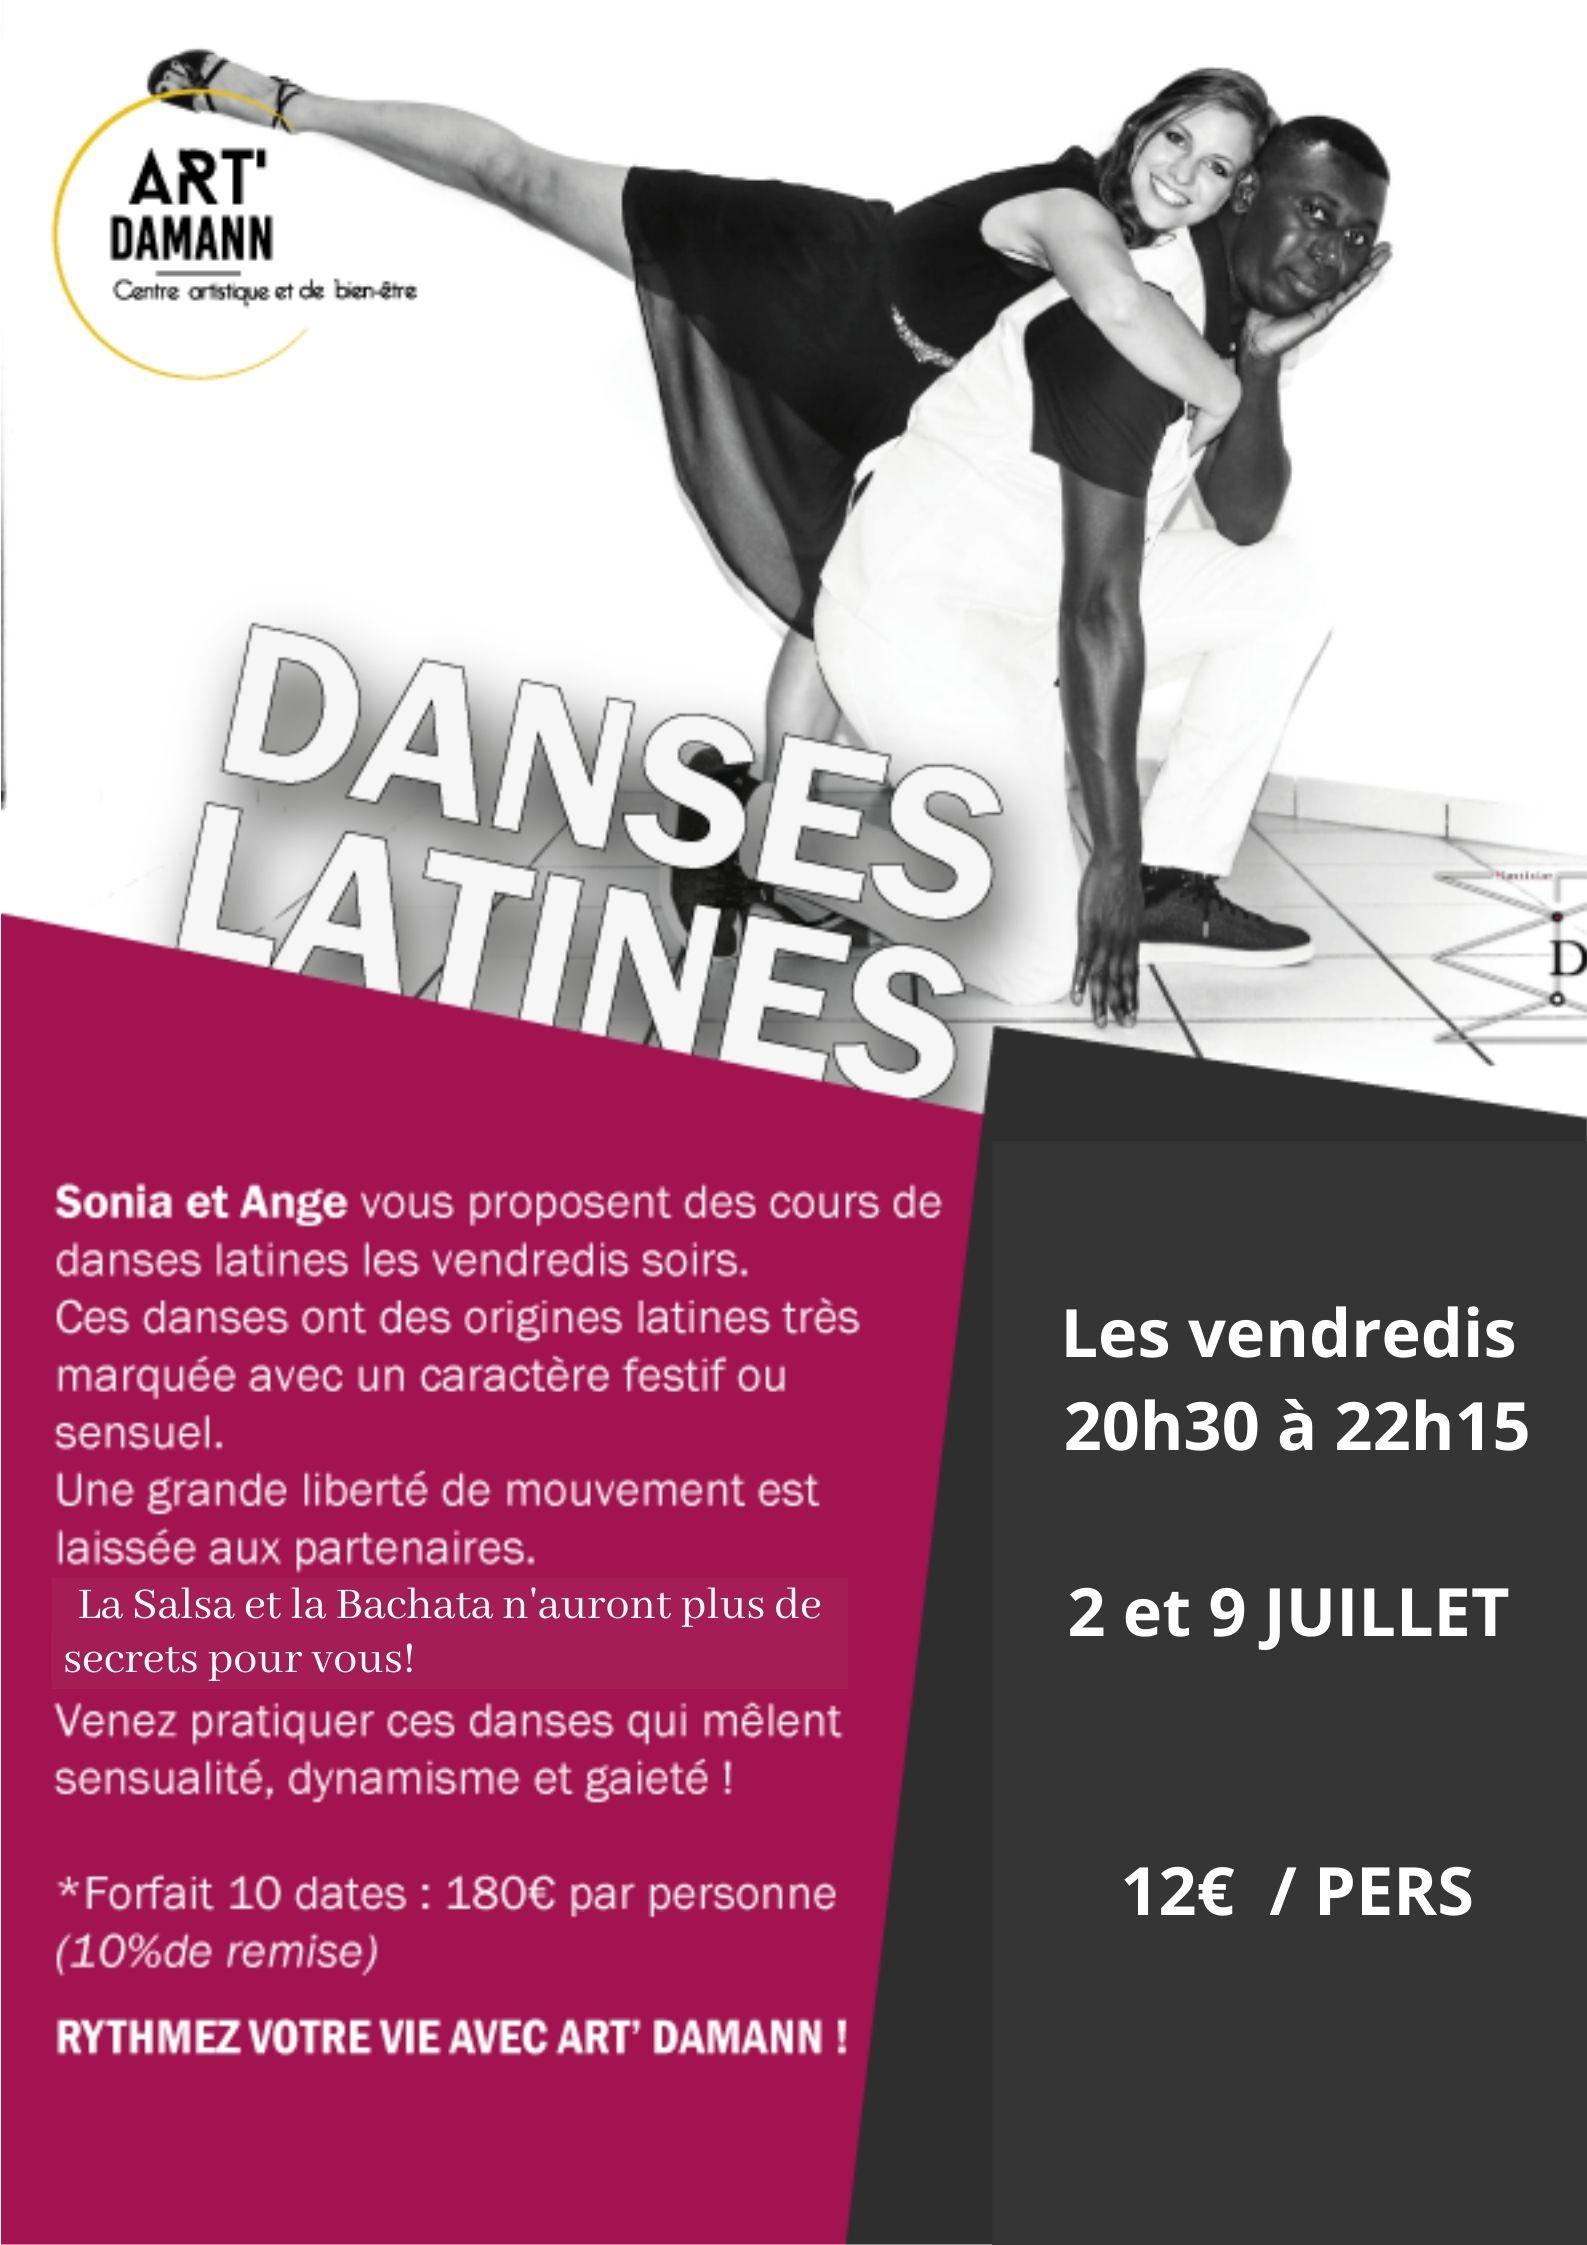 danses latines 2 et 9 juillet